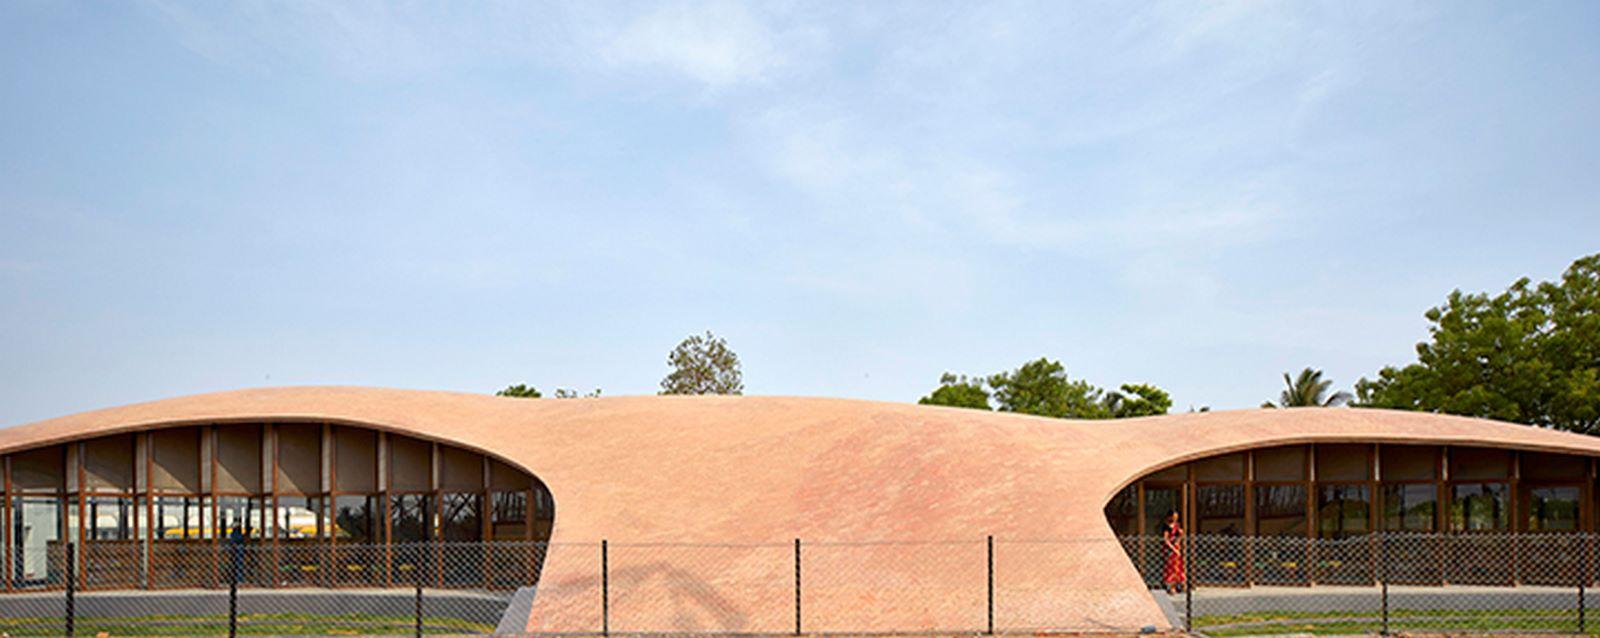 7 Innovative Public Space Designs in India